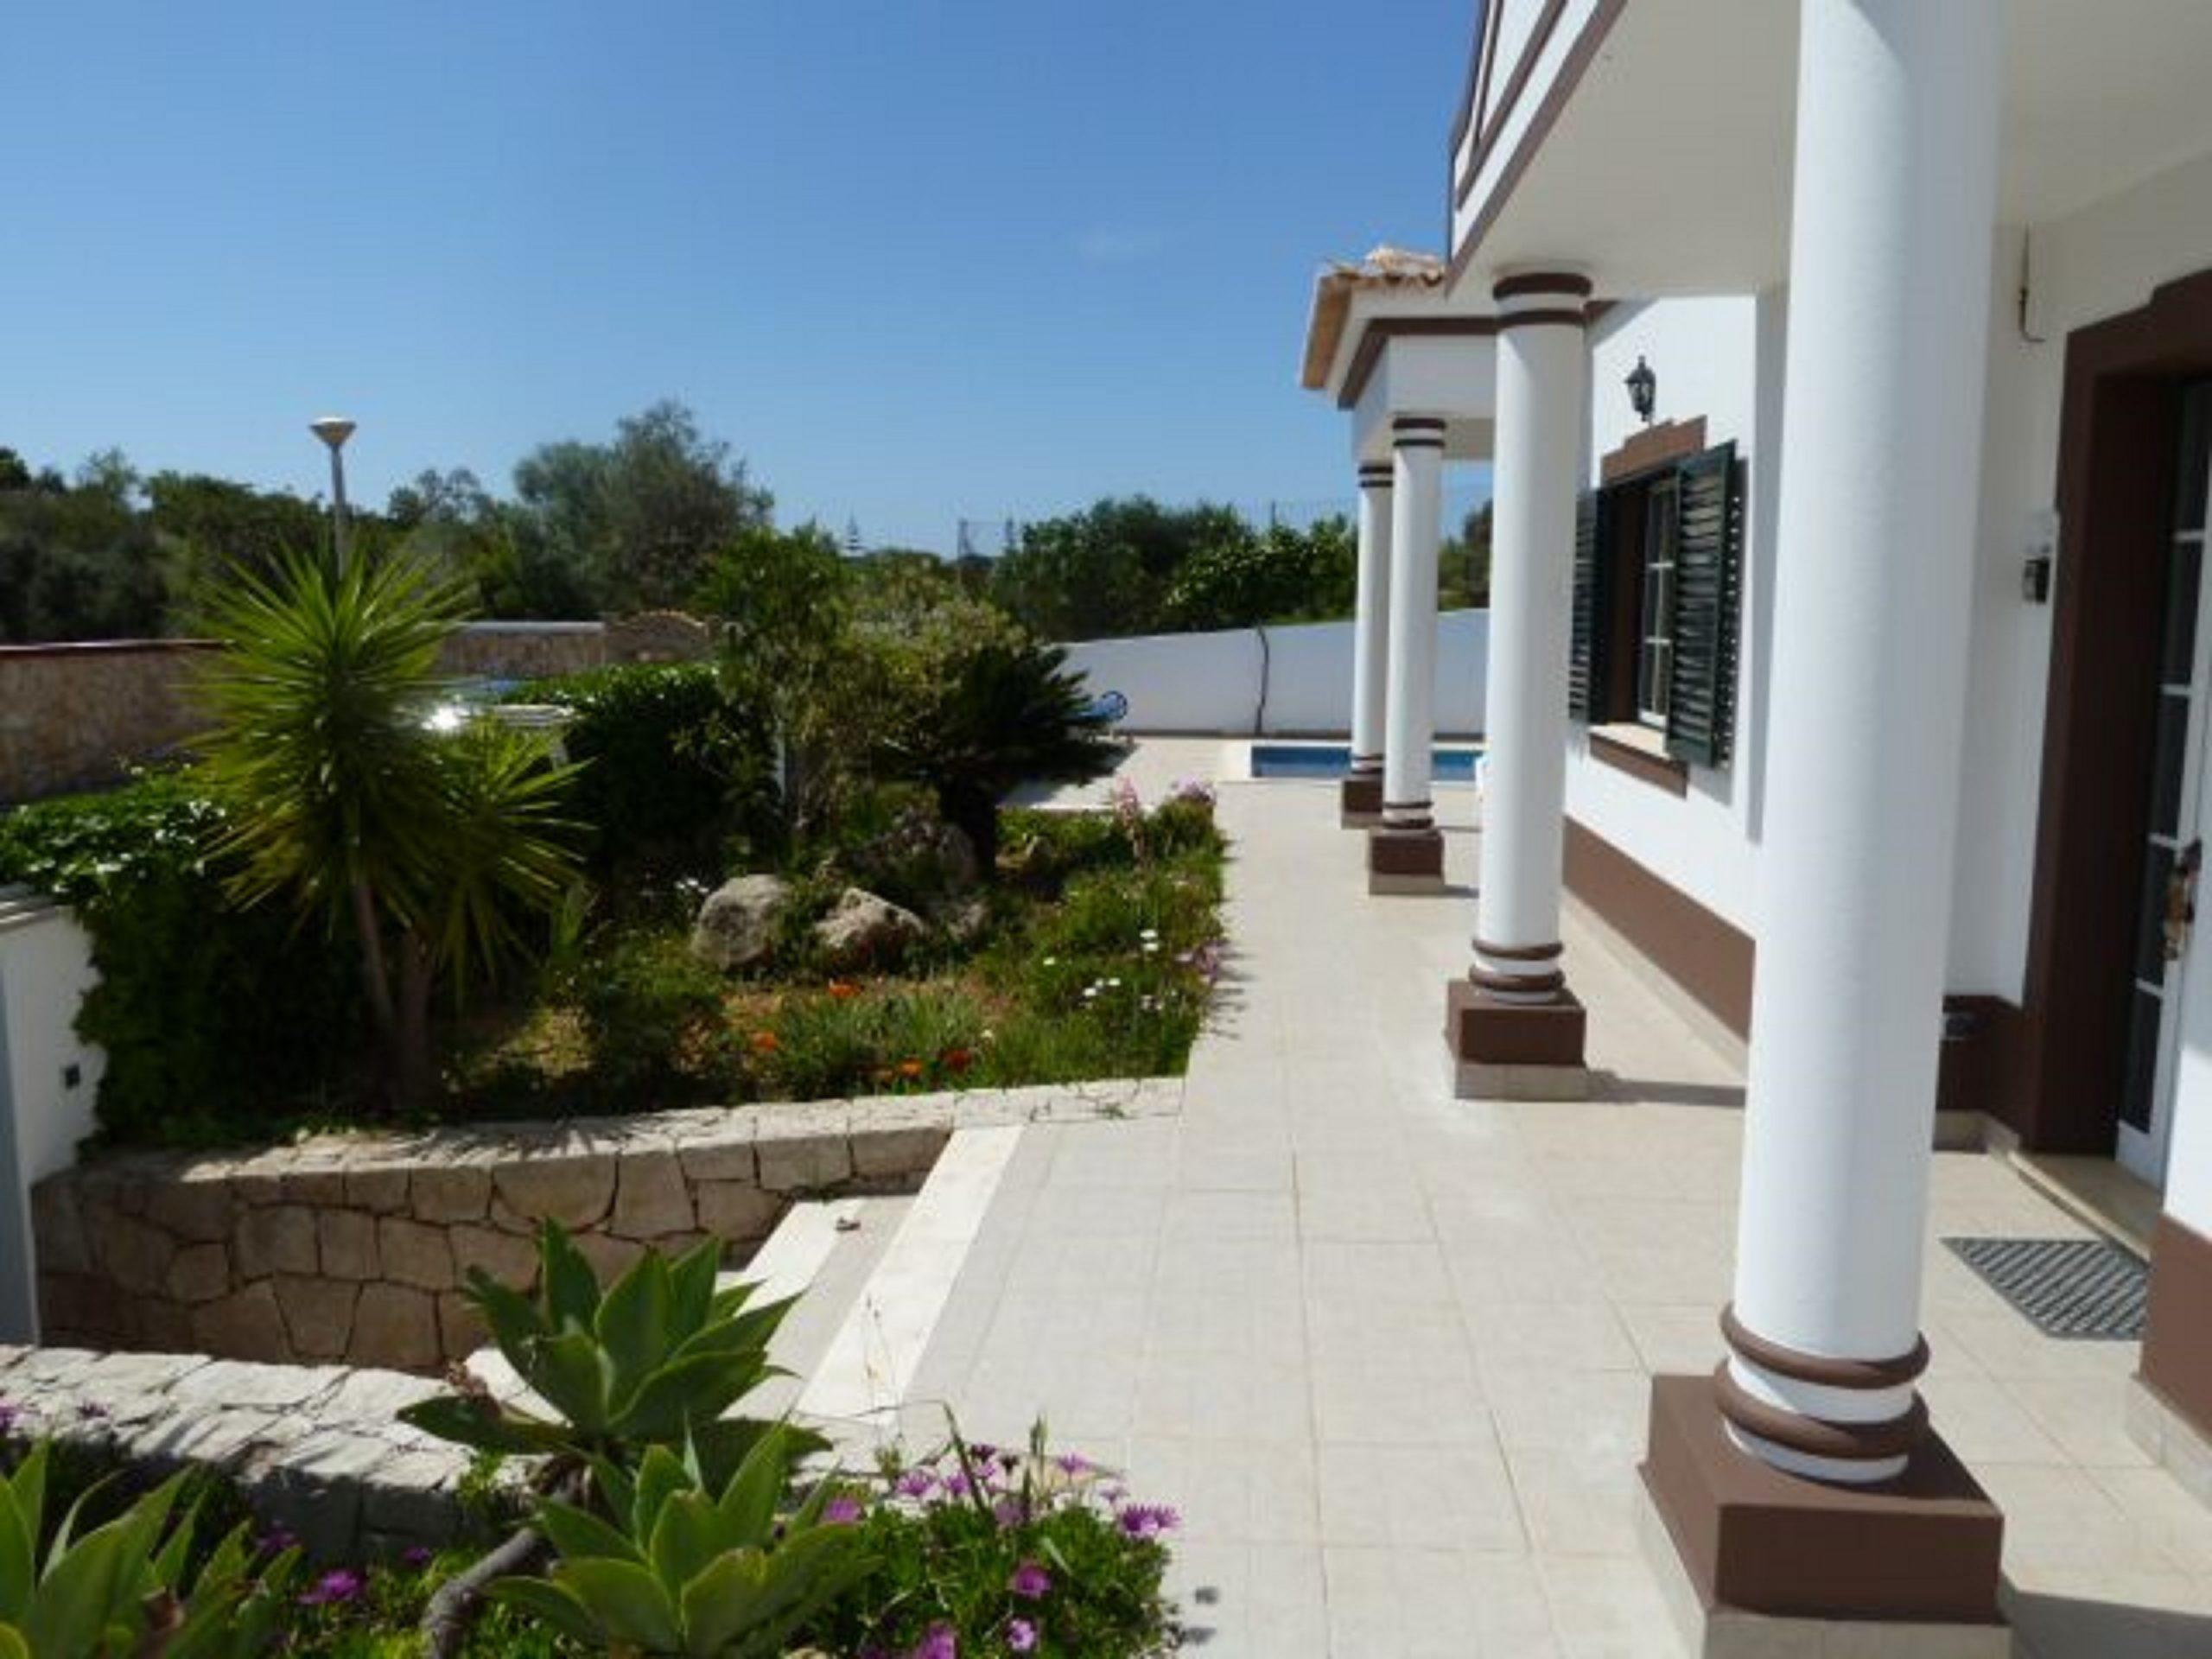 Villa entrance & long terrace of this, very sunny, very pretty, quite villa.